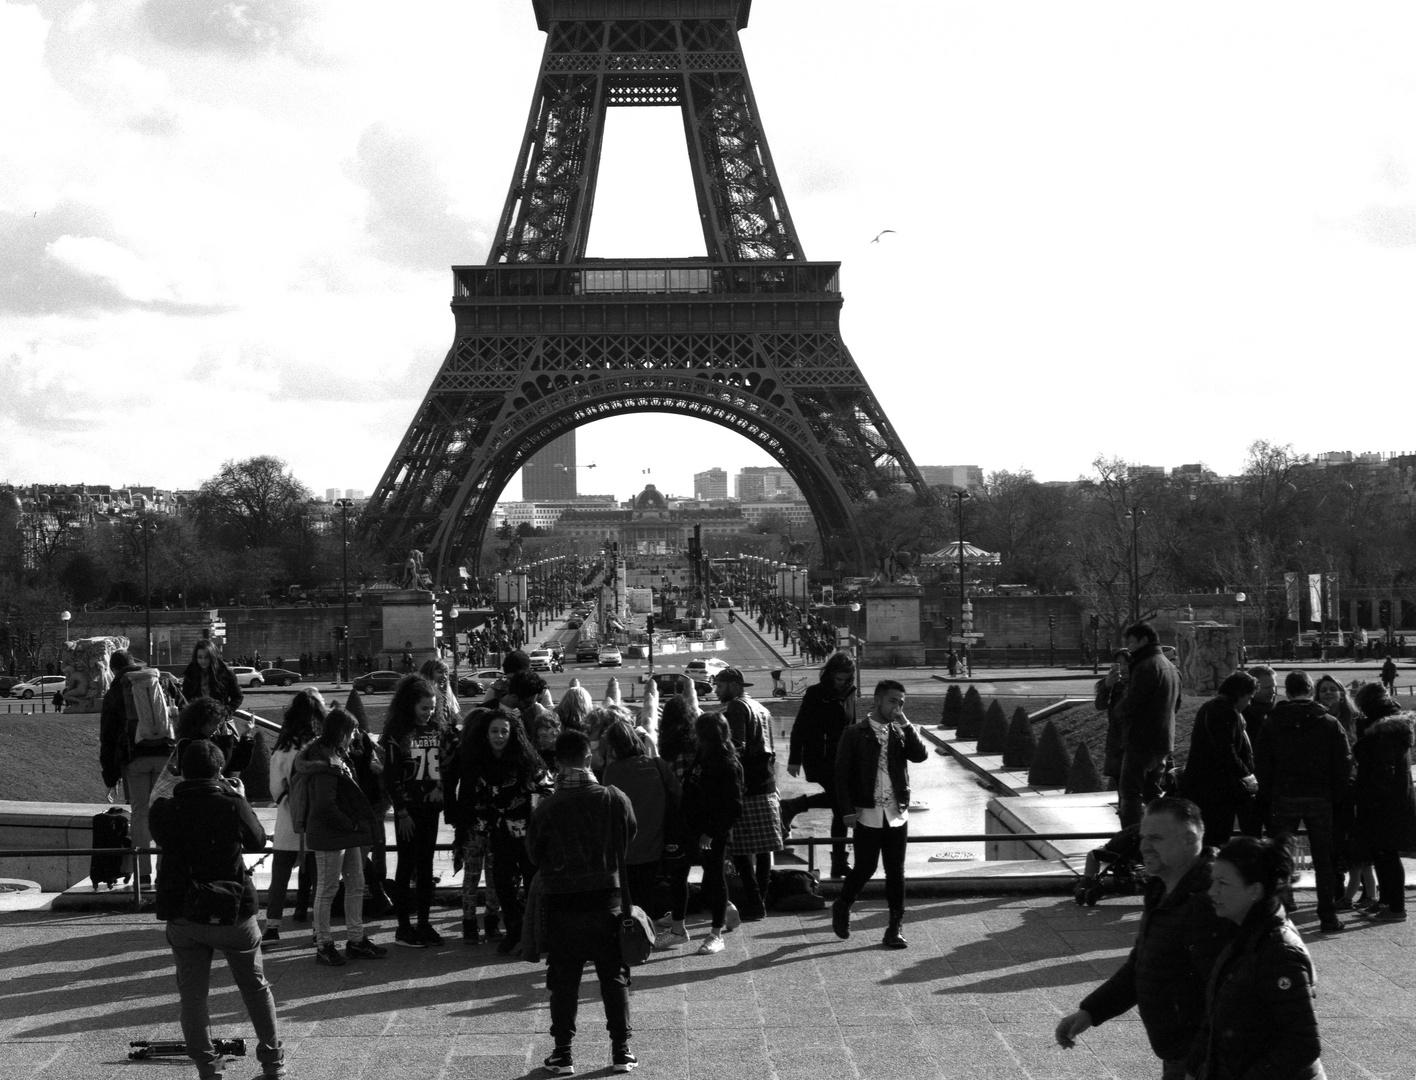 Am Trocadero - Eiffelturm